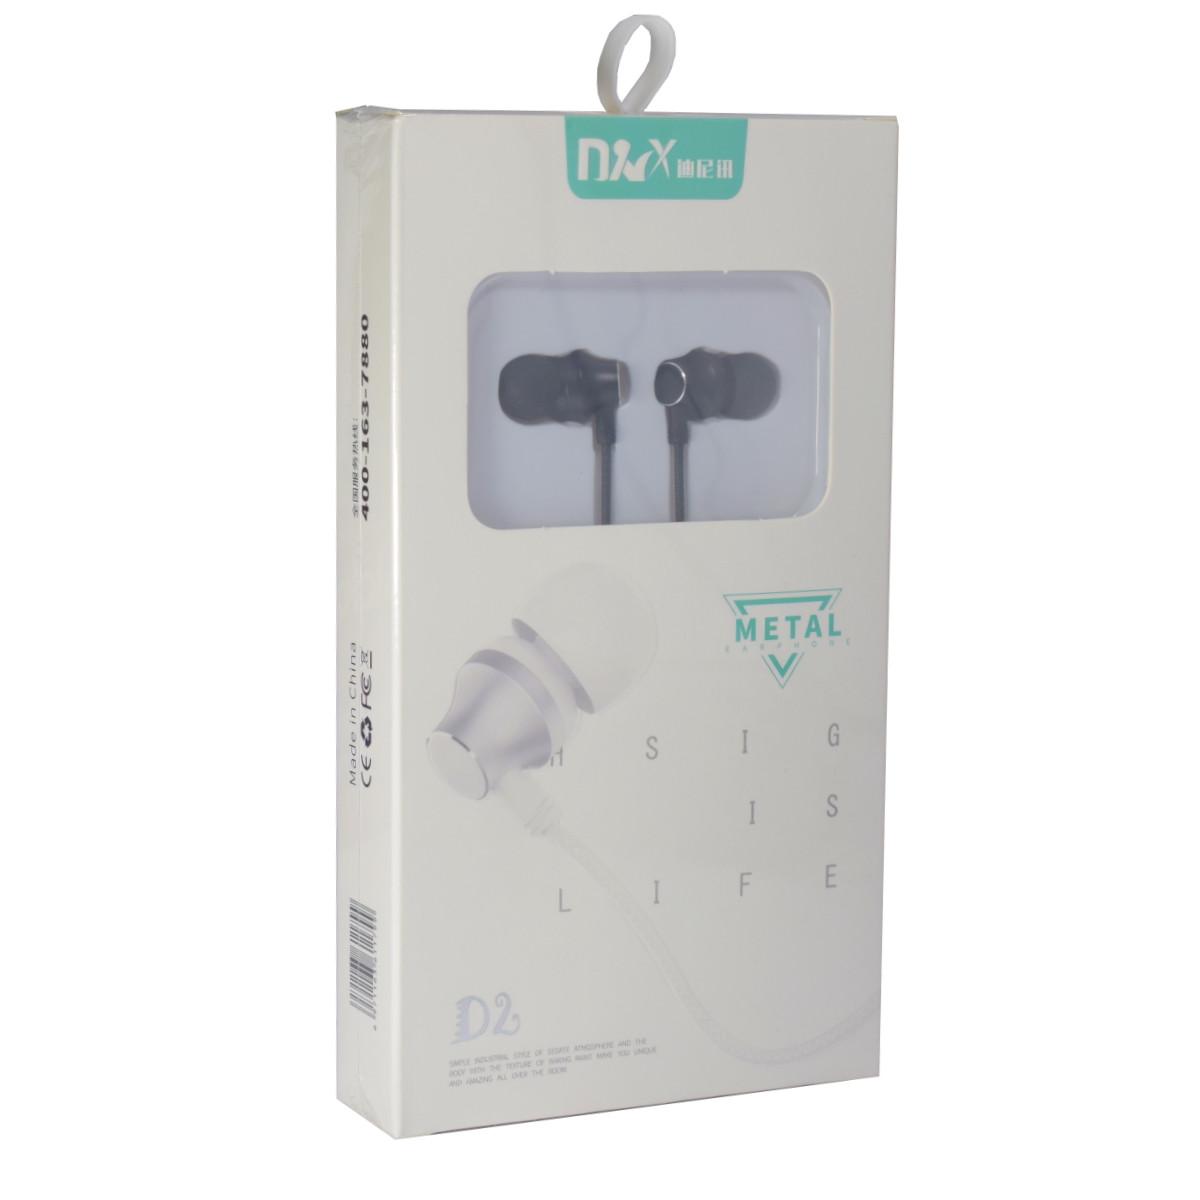 Навушники HF DNX, D2